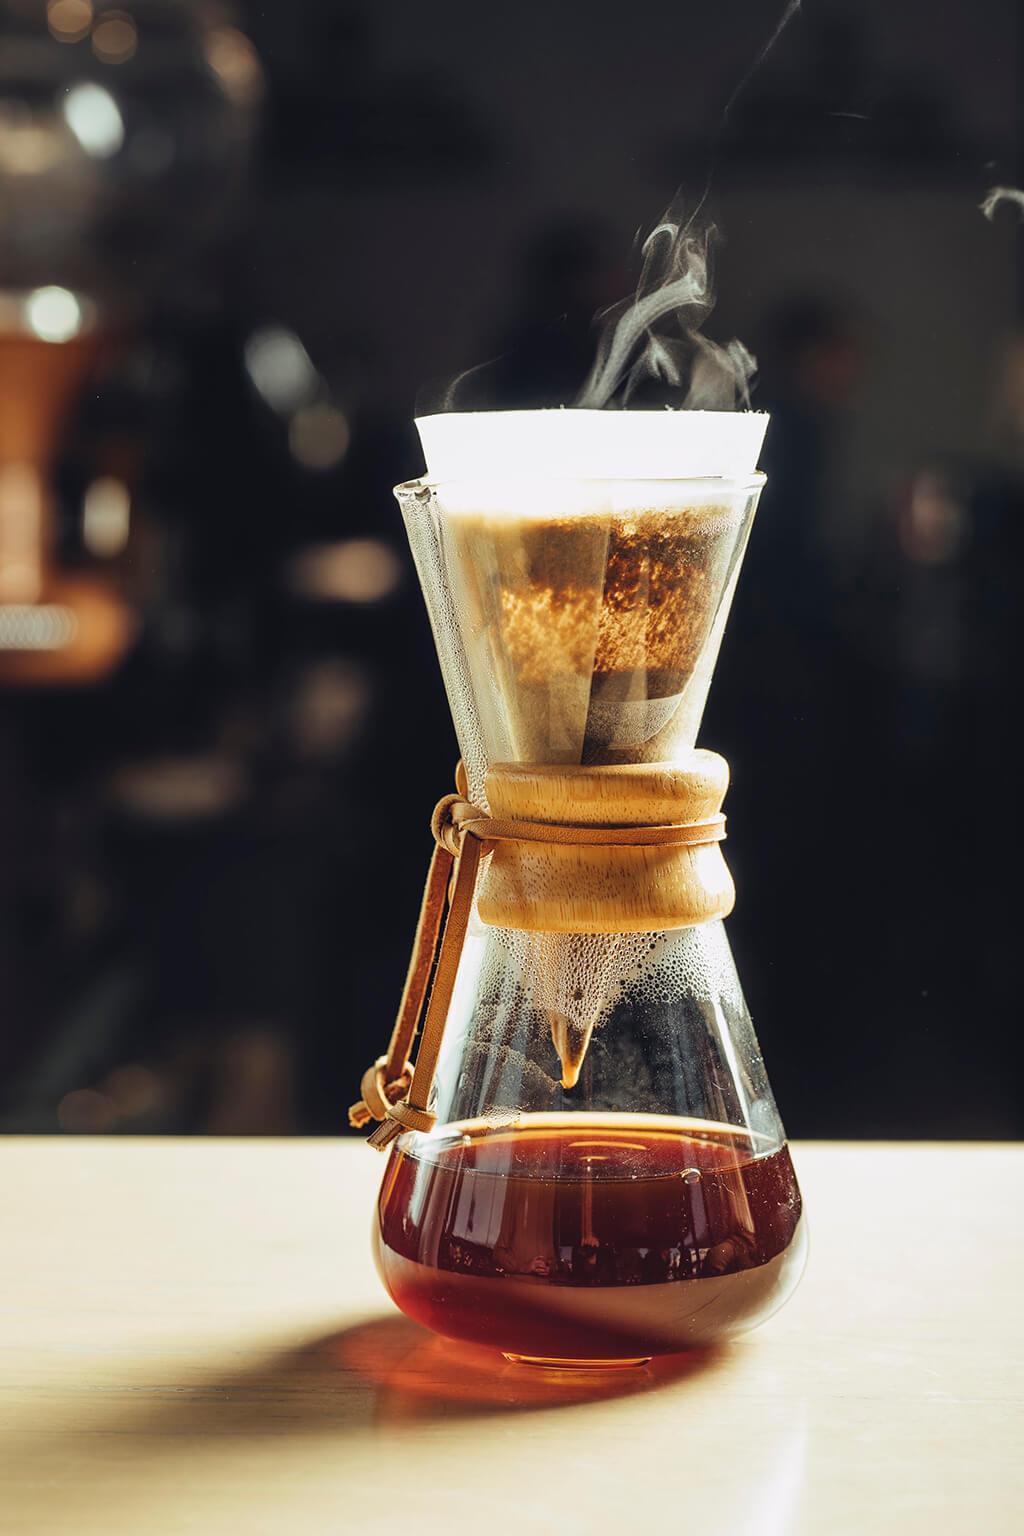 Coffee Island's Chemex